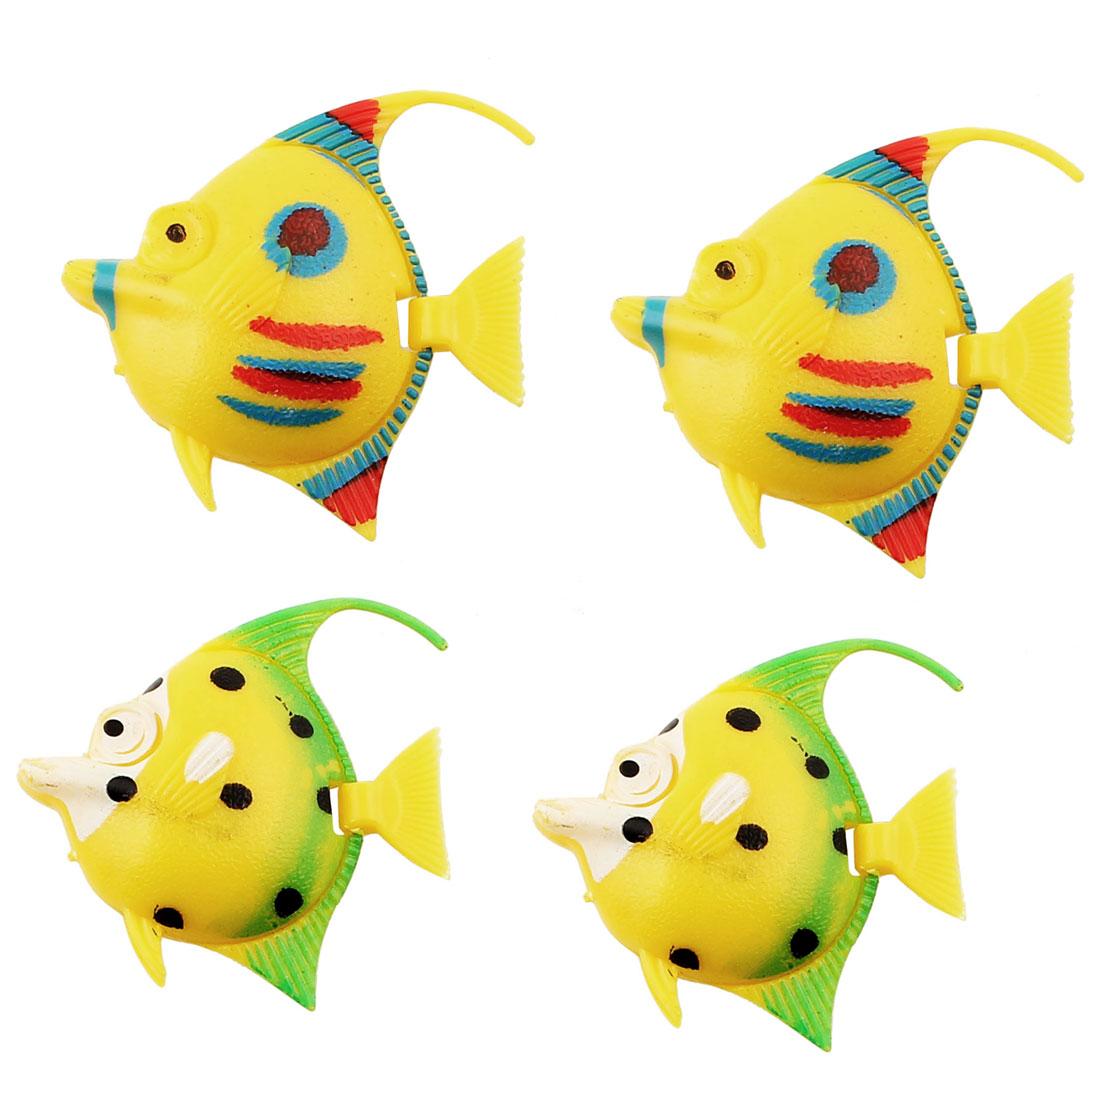 Aquarium Artificial Fake Floating Fish Decoration Ornament Yellow 4pcs